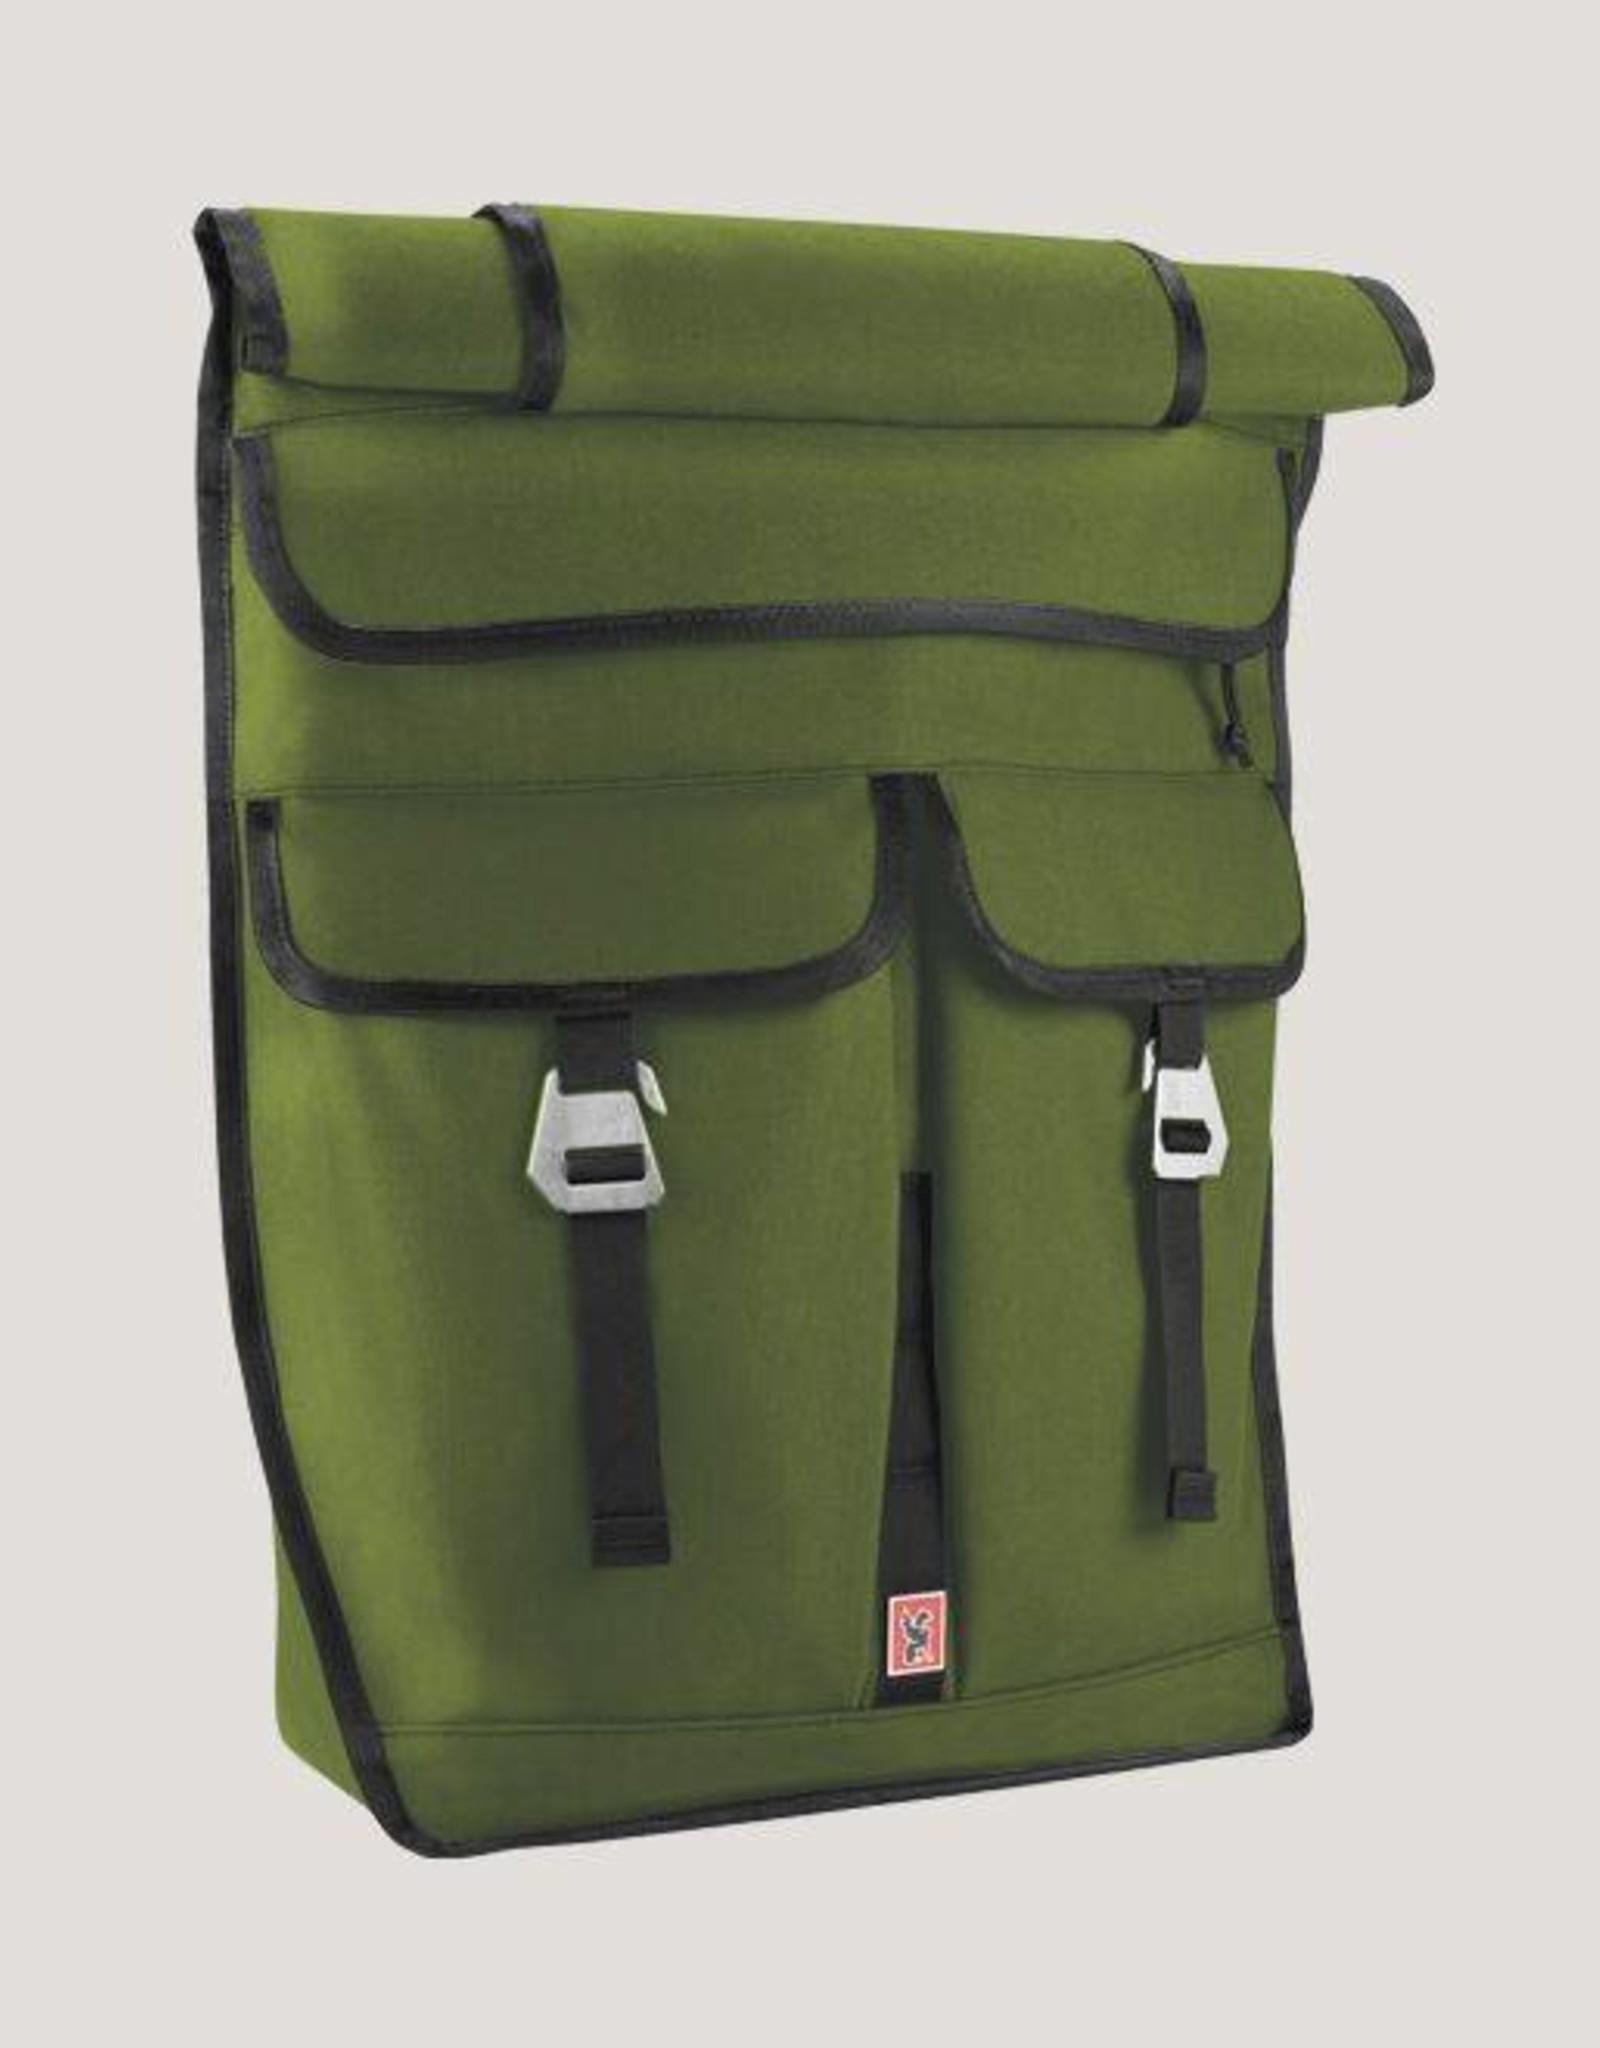 Chrome Bag - Chrome Orlov Olive Green Backpack Rolltop